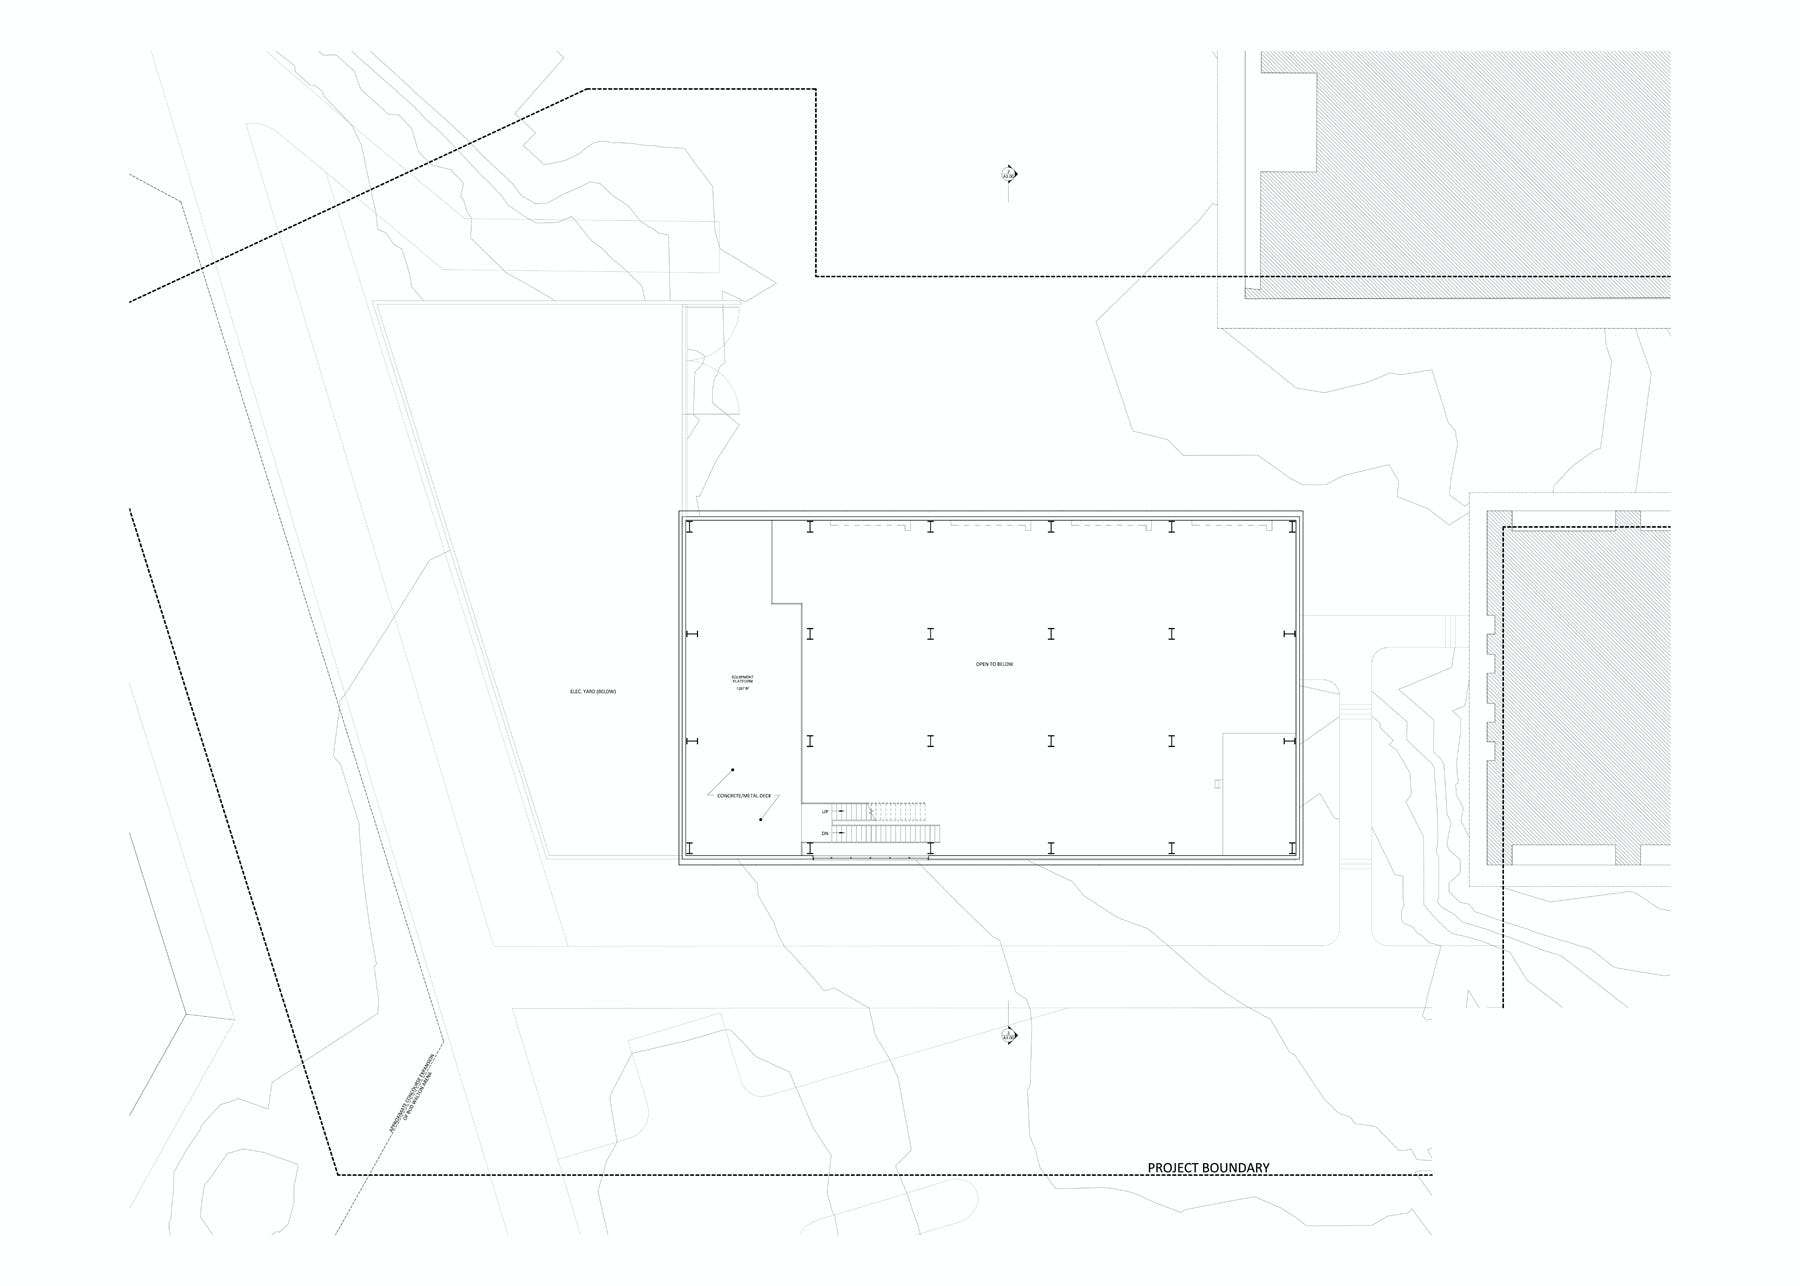 12 35 leroy floor plan